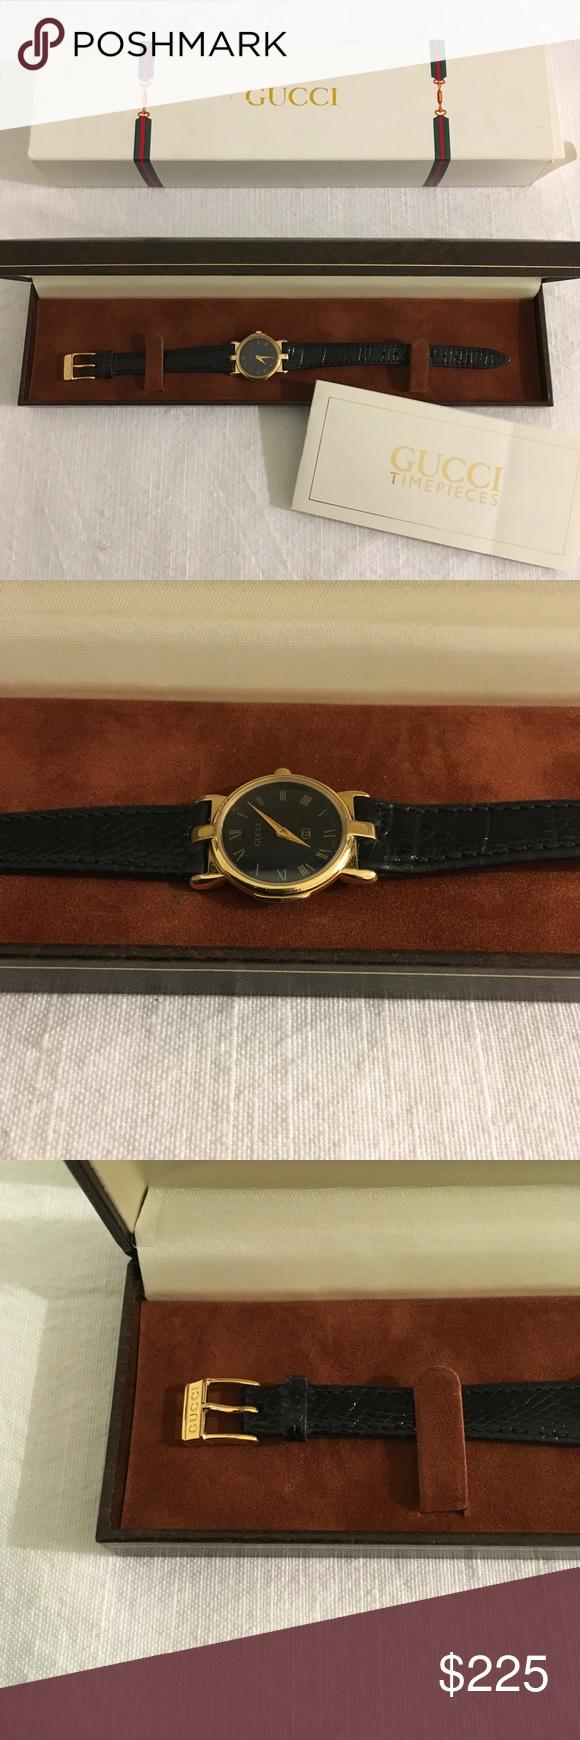 d07f0cd86e5 Gucci Watch 3400L VTG Gucci Watch 3400L with black Gucci band